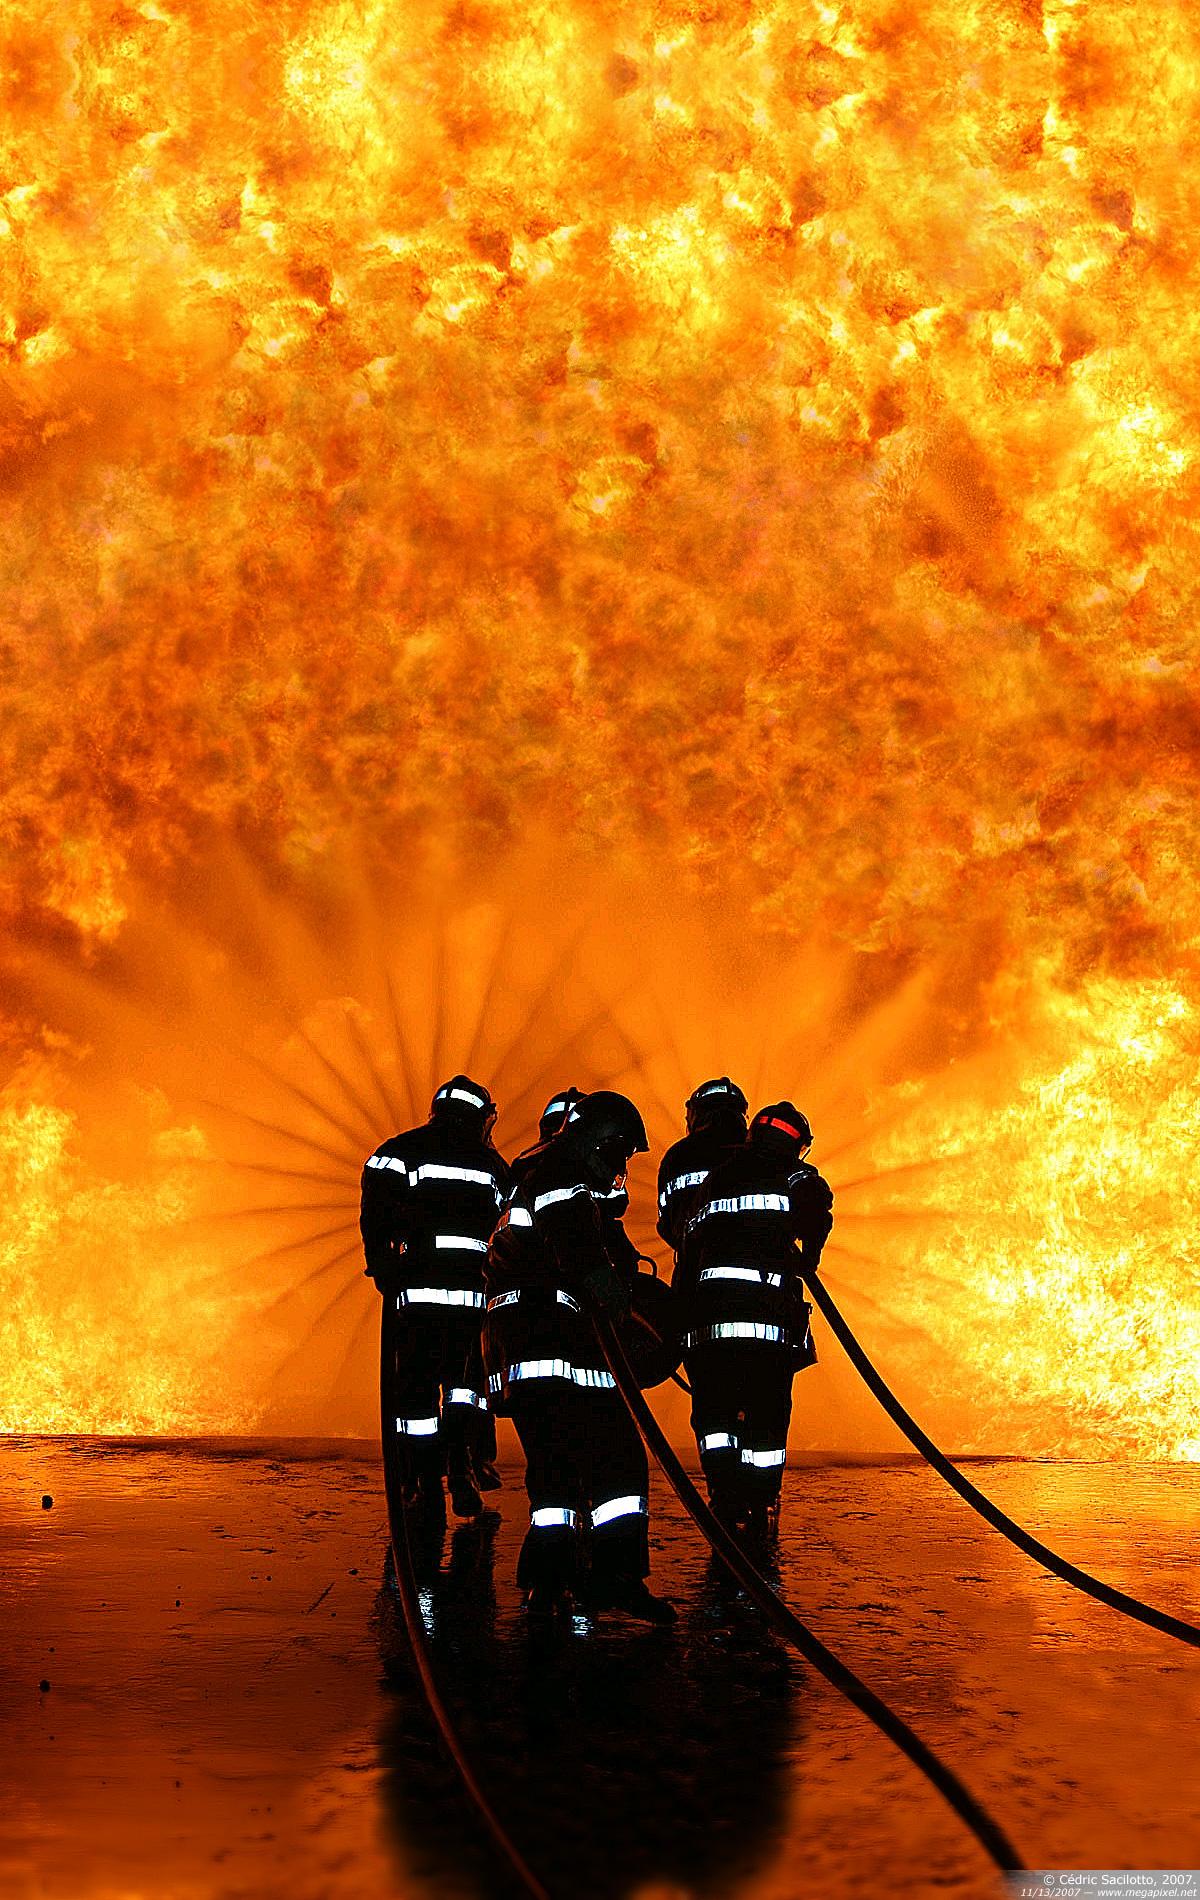 Firefighter Desktop Backgrounds WallpaperSafari